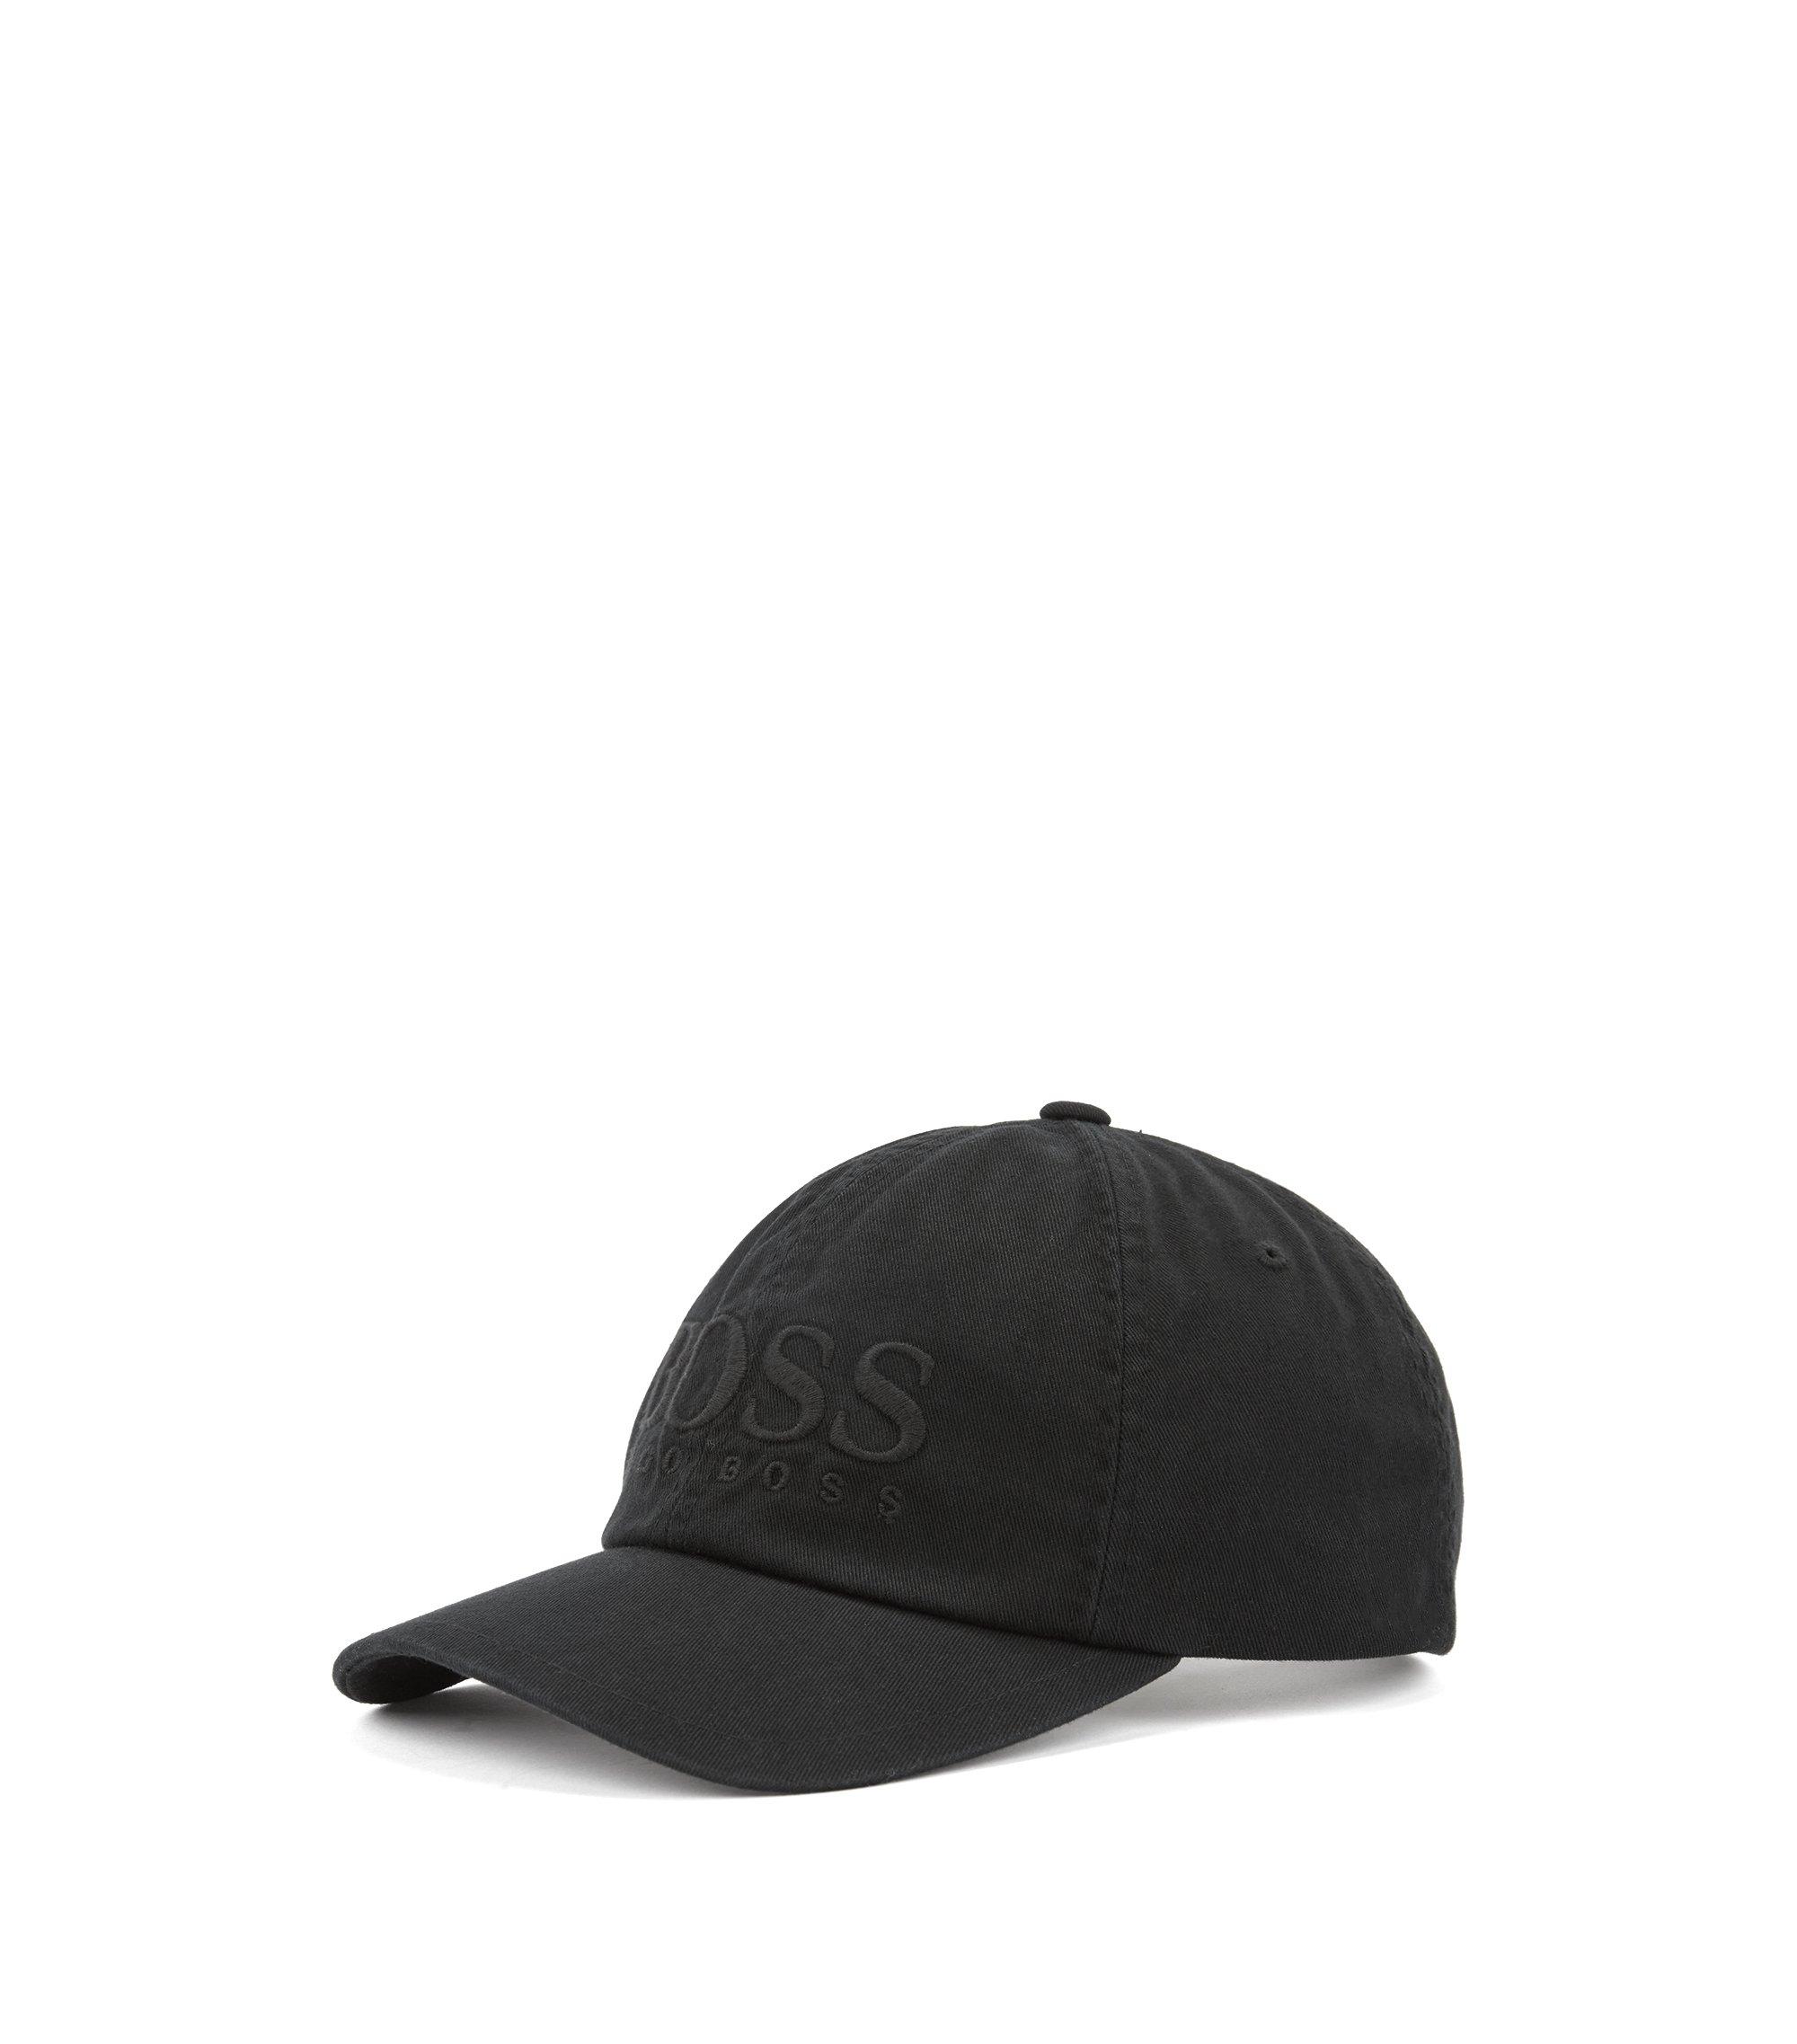 Casquette de base-ball en sergé de coton avec logo, Noir